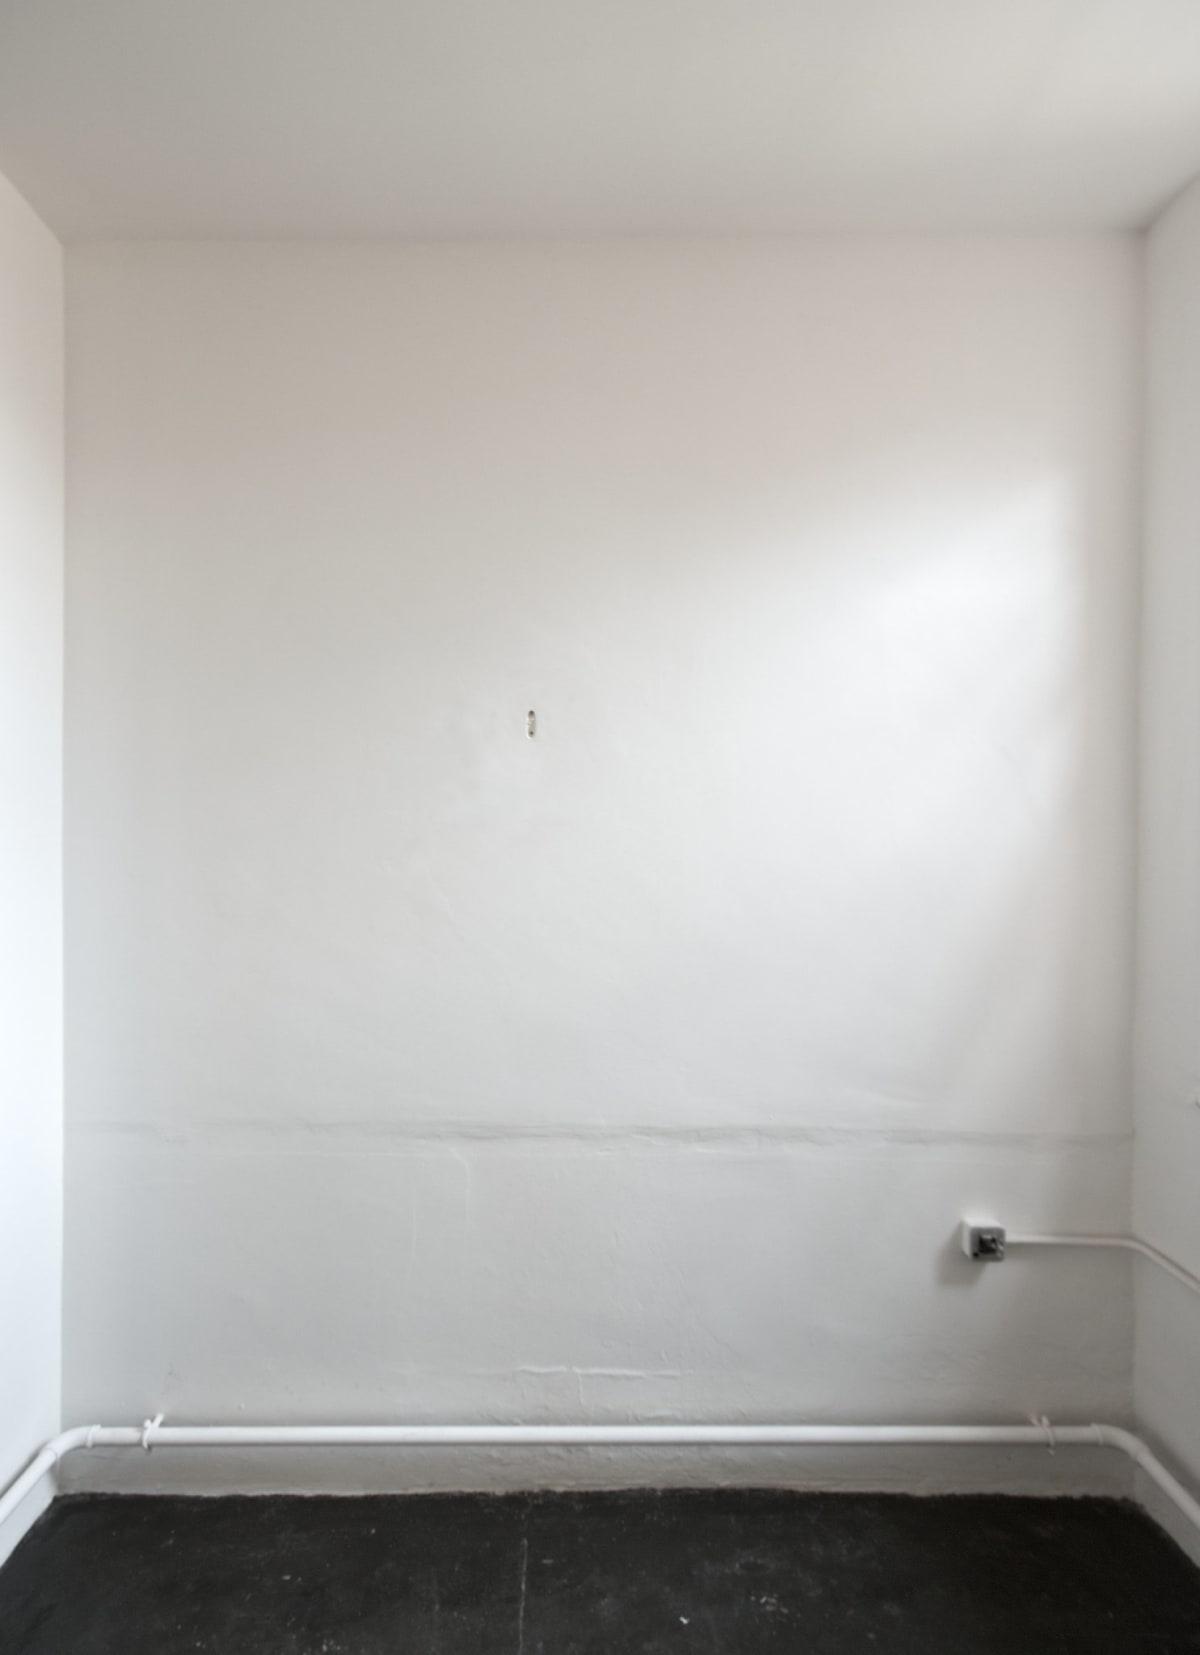 Richard Rigg, Wall Hanging, 2010